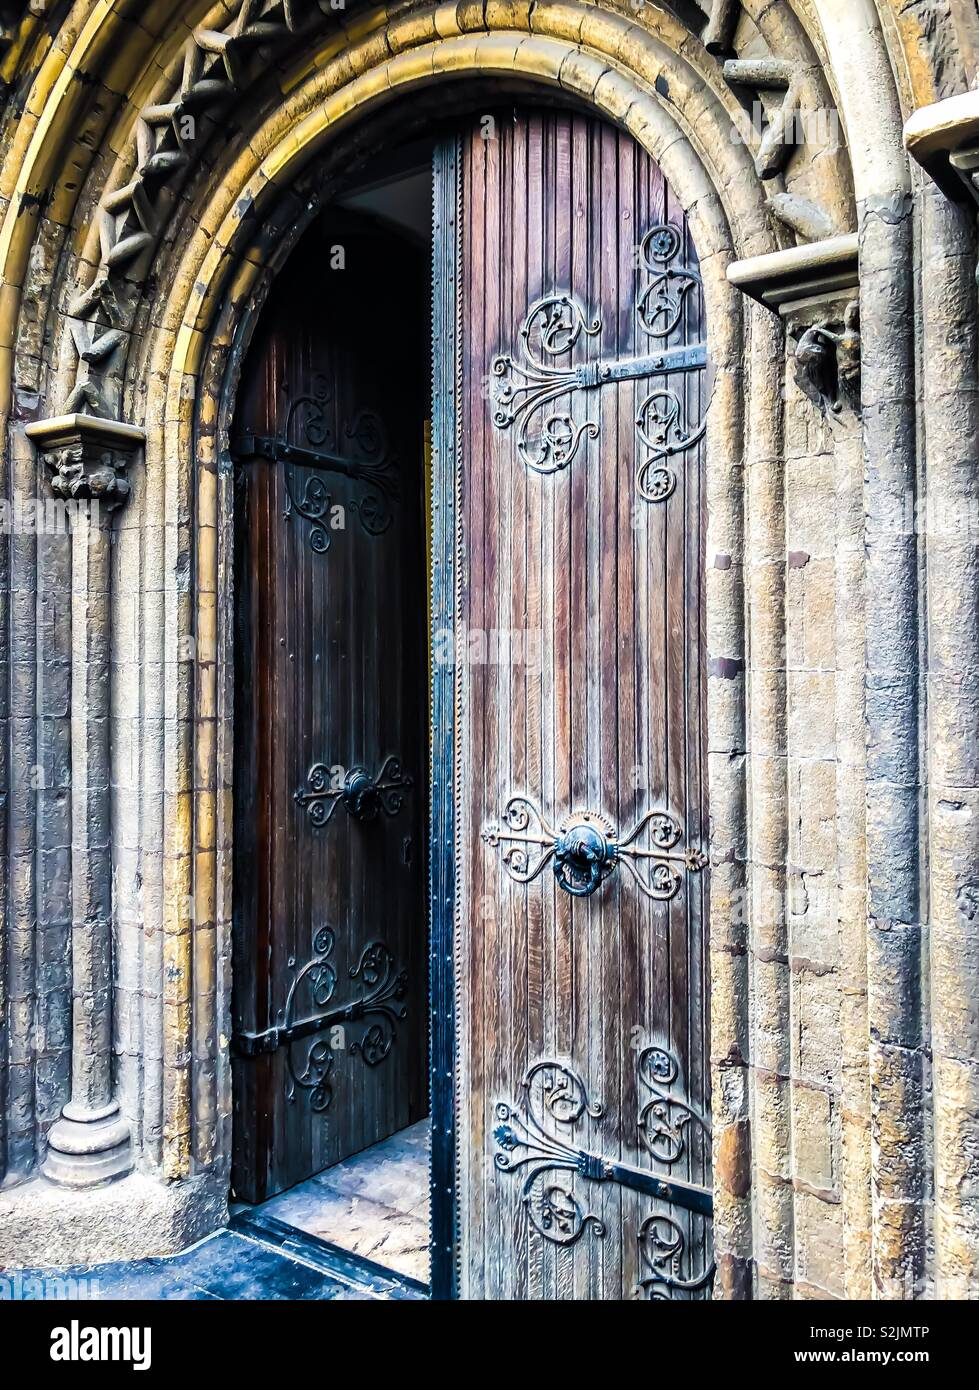 Old weathered church door. - Stock Image